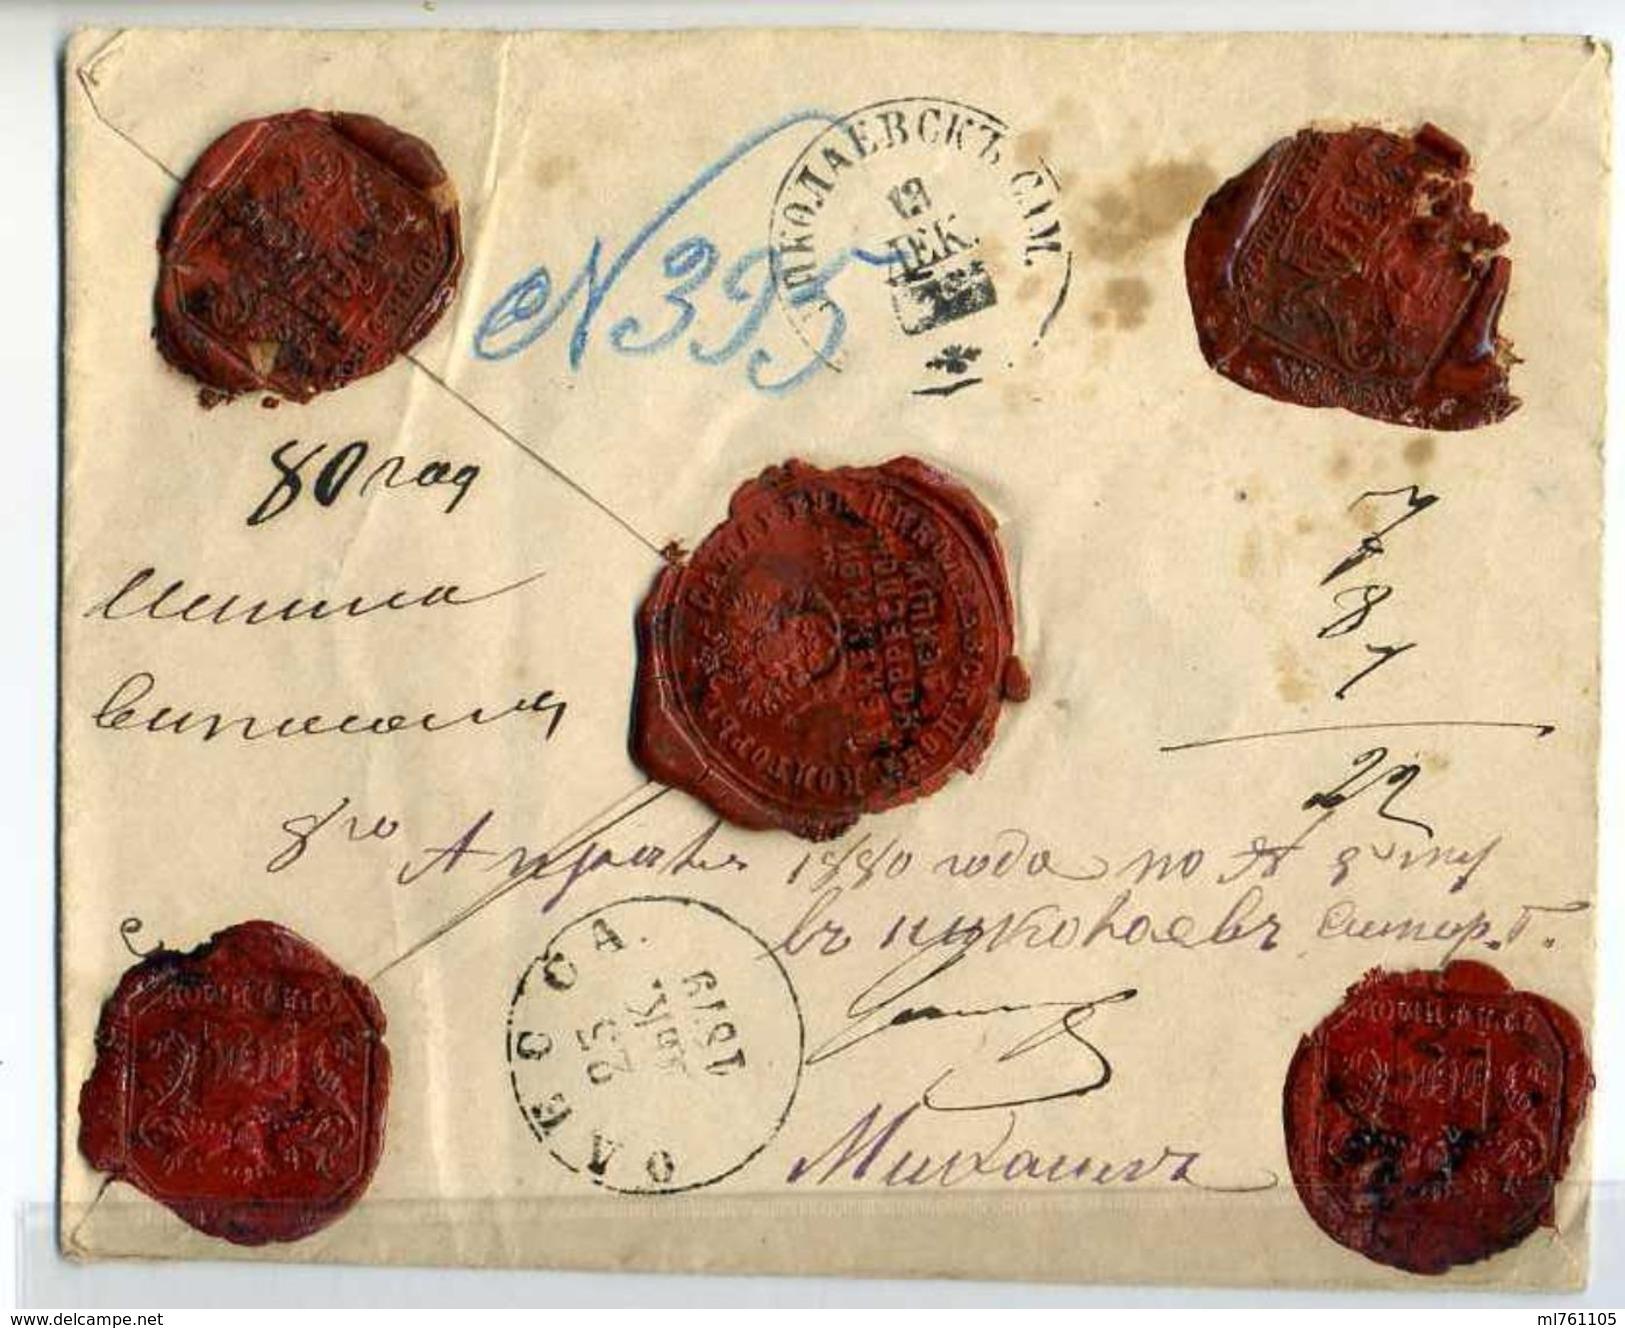 Russia 1879 Nikolaevsk Samara Gov To Aphon Money Letter Seal Waxes - Briefe U. Dokumente